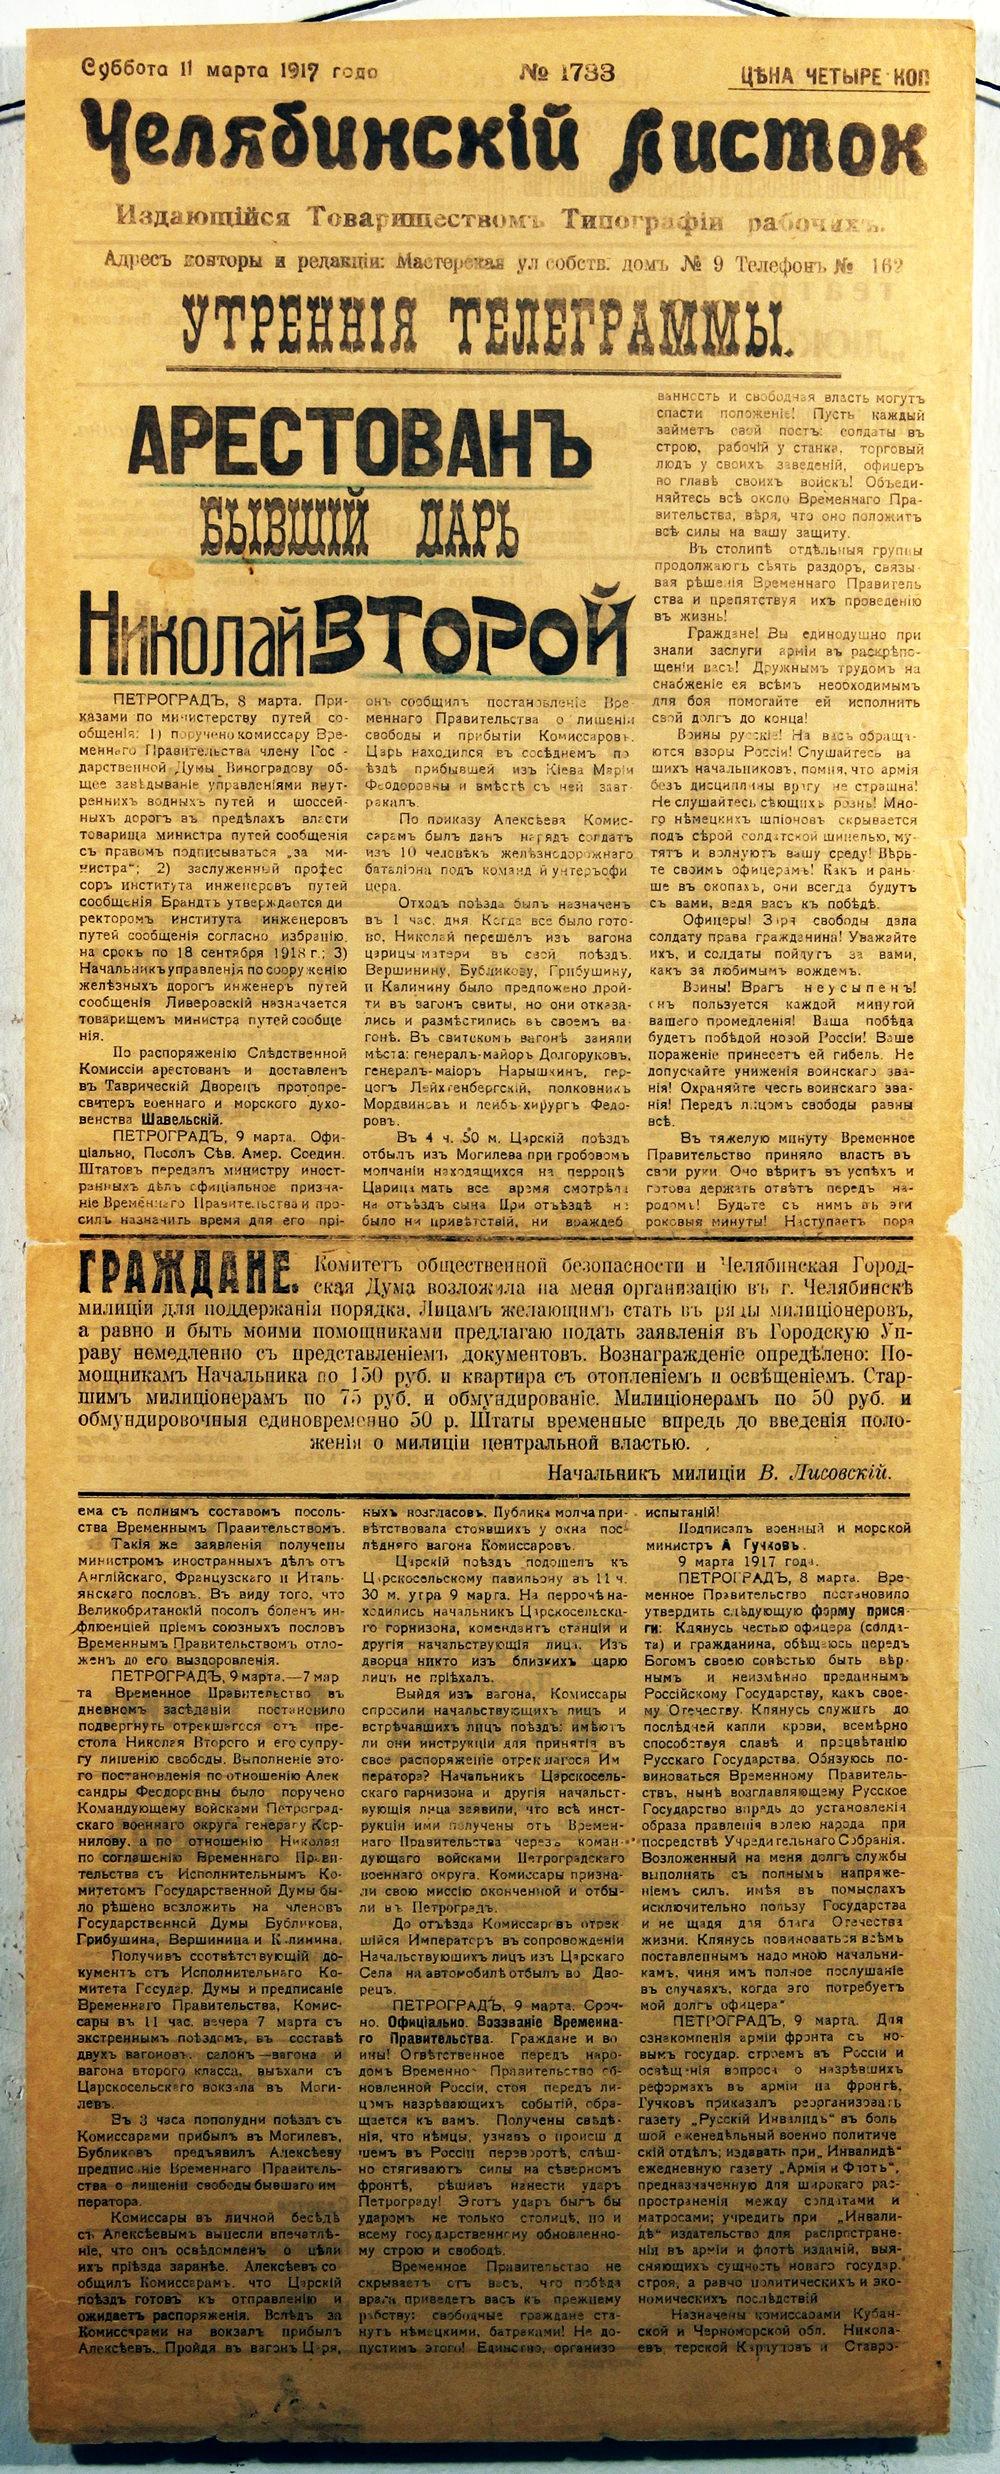 Арестован бывший царь Николай II